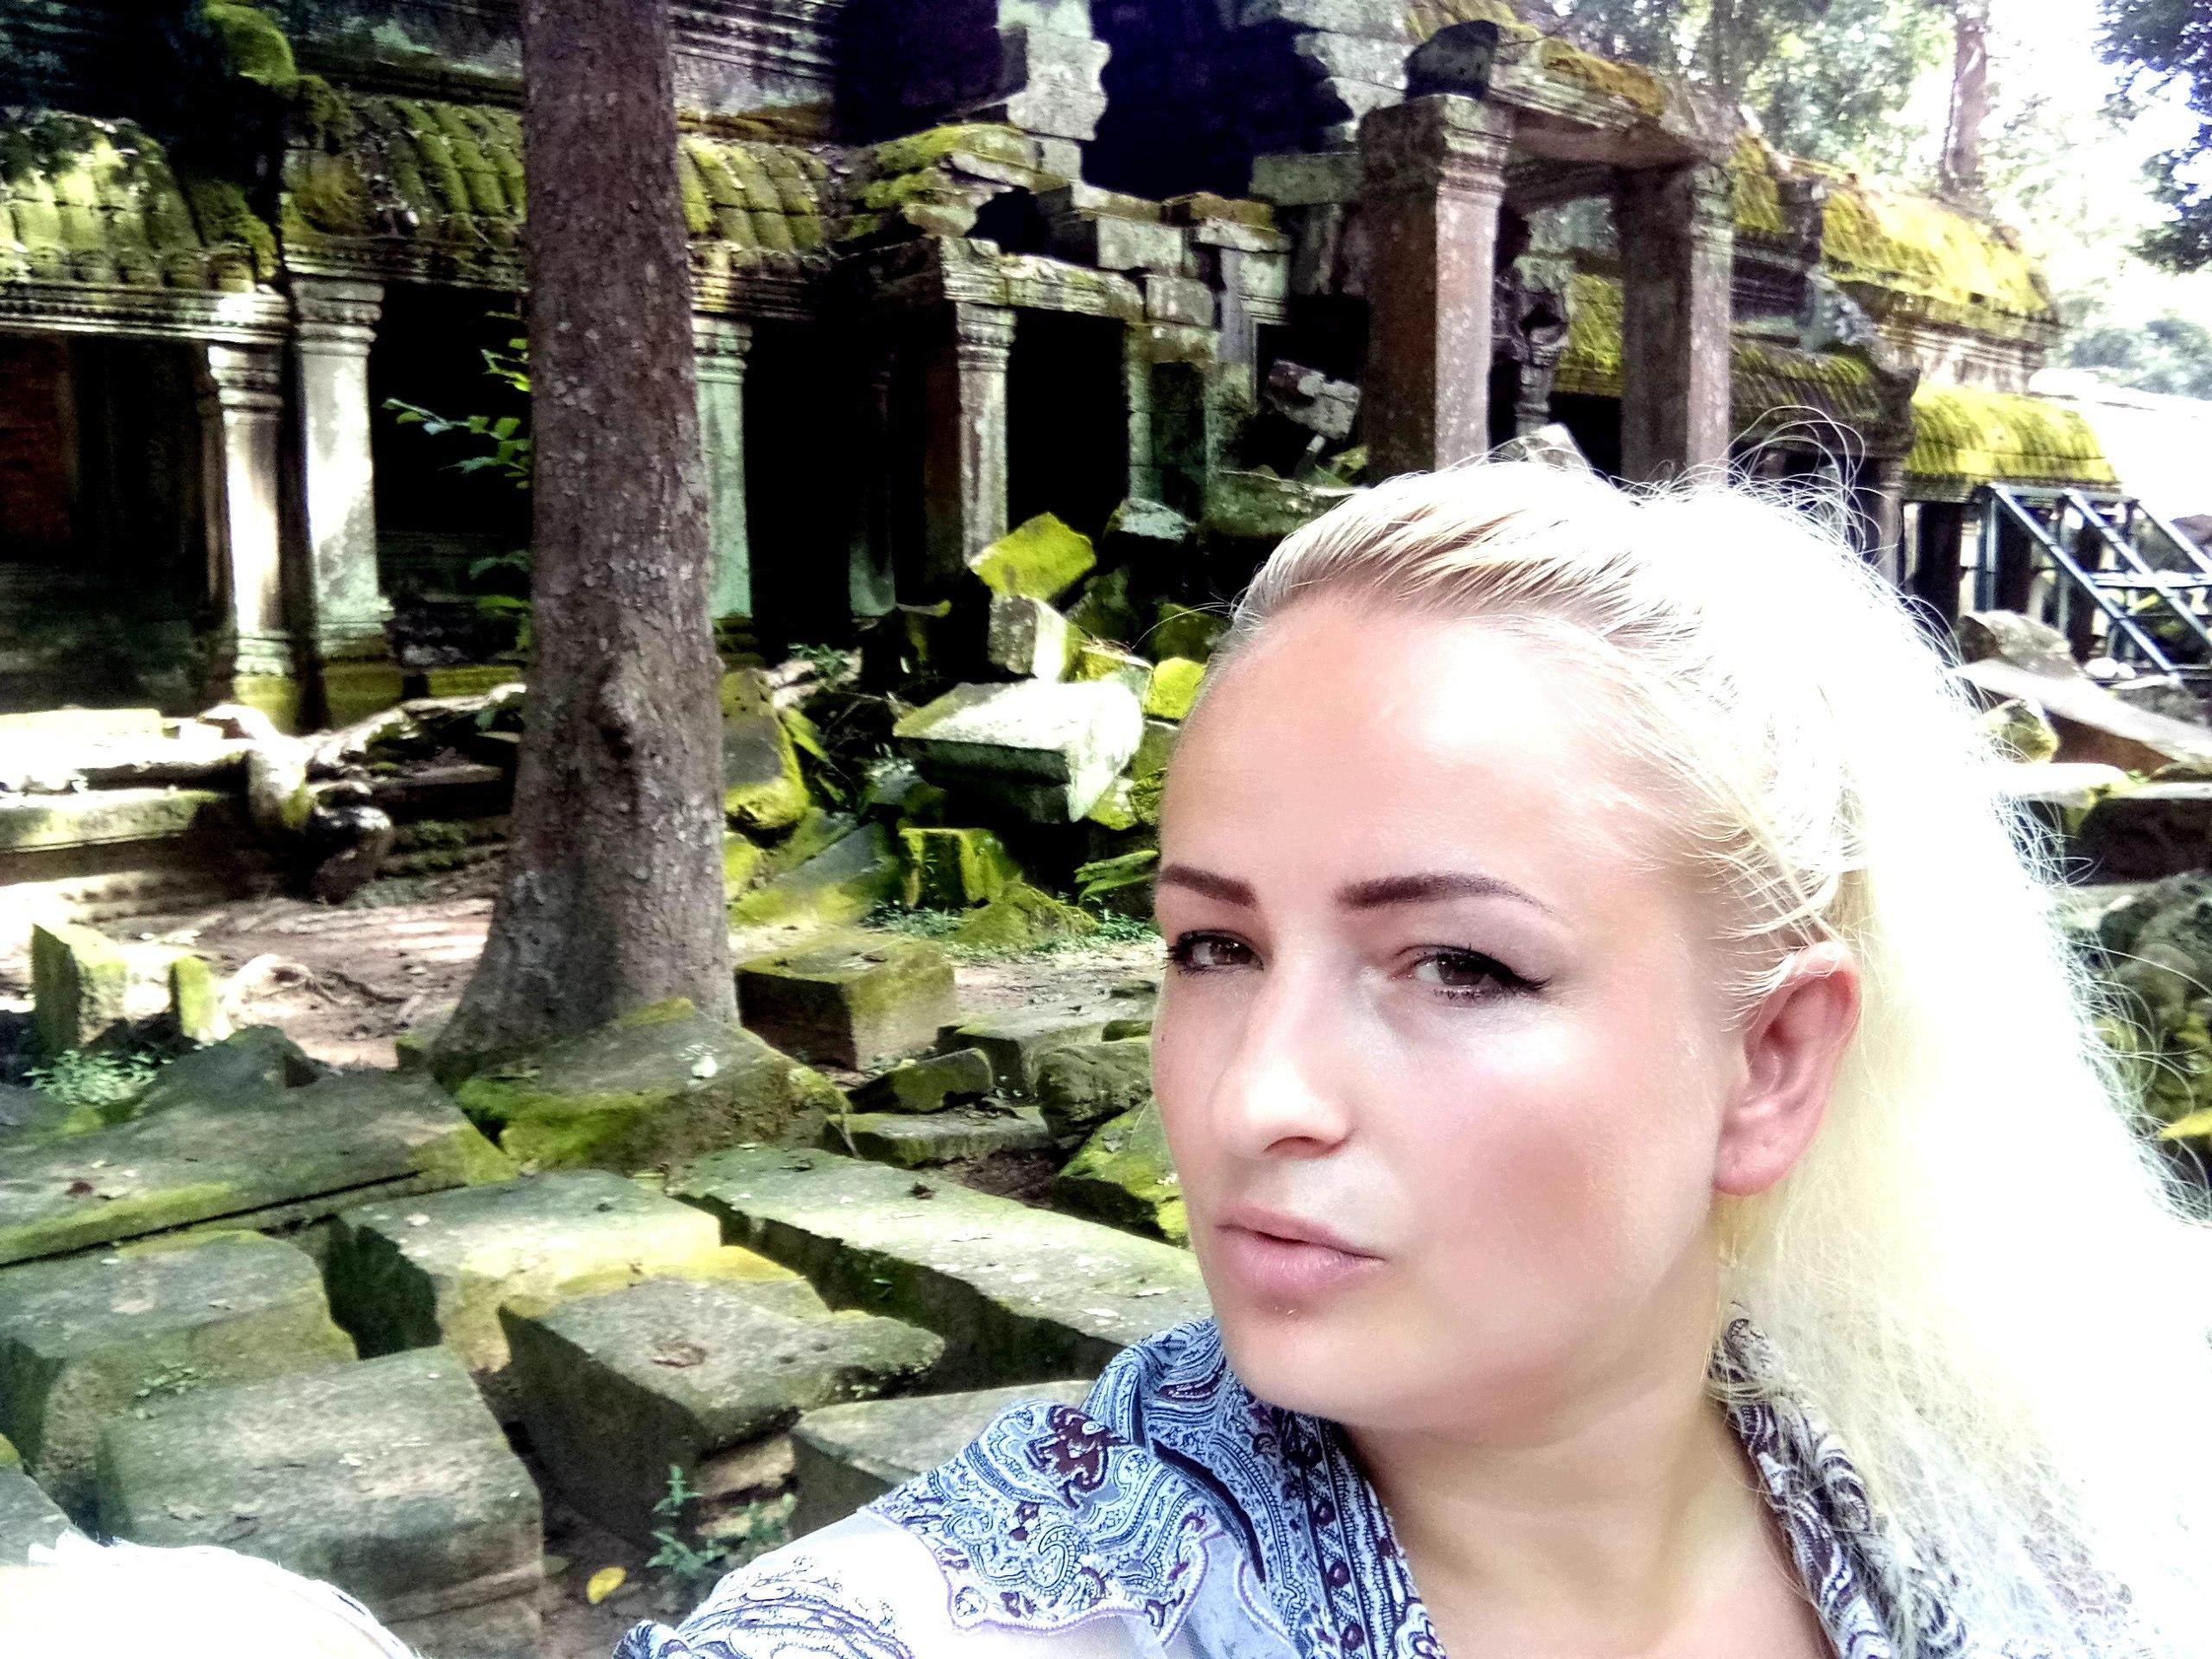 Елена Руденко (Валтея). Камбоджа. Ангкор. - Страница 3 Qc2wwz0m3b4